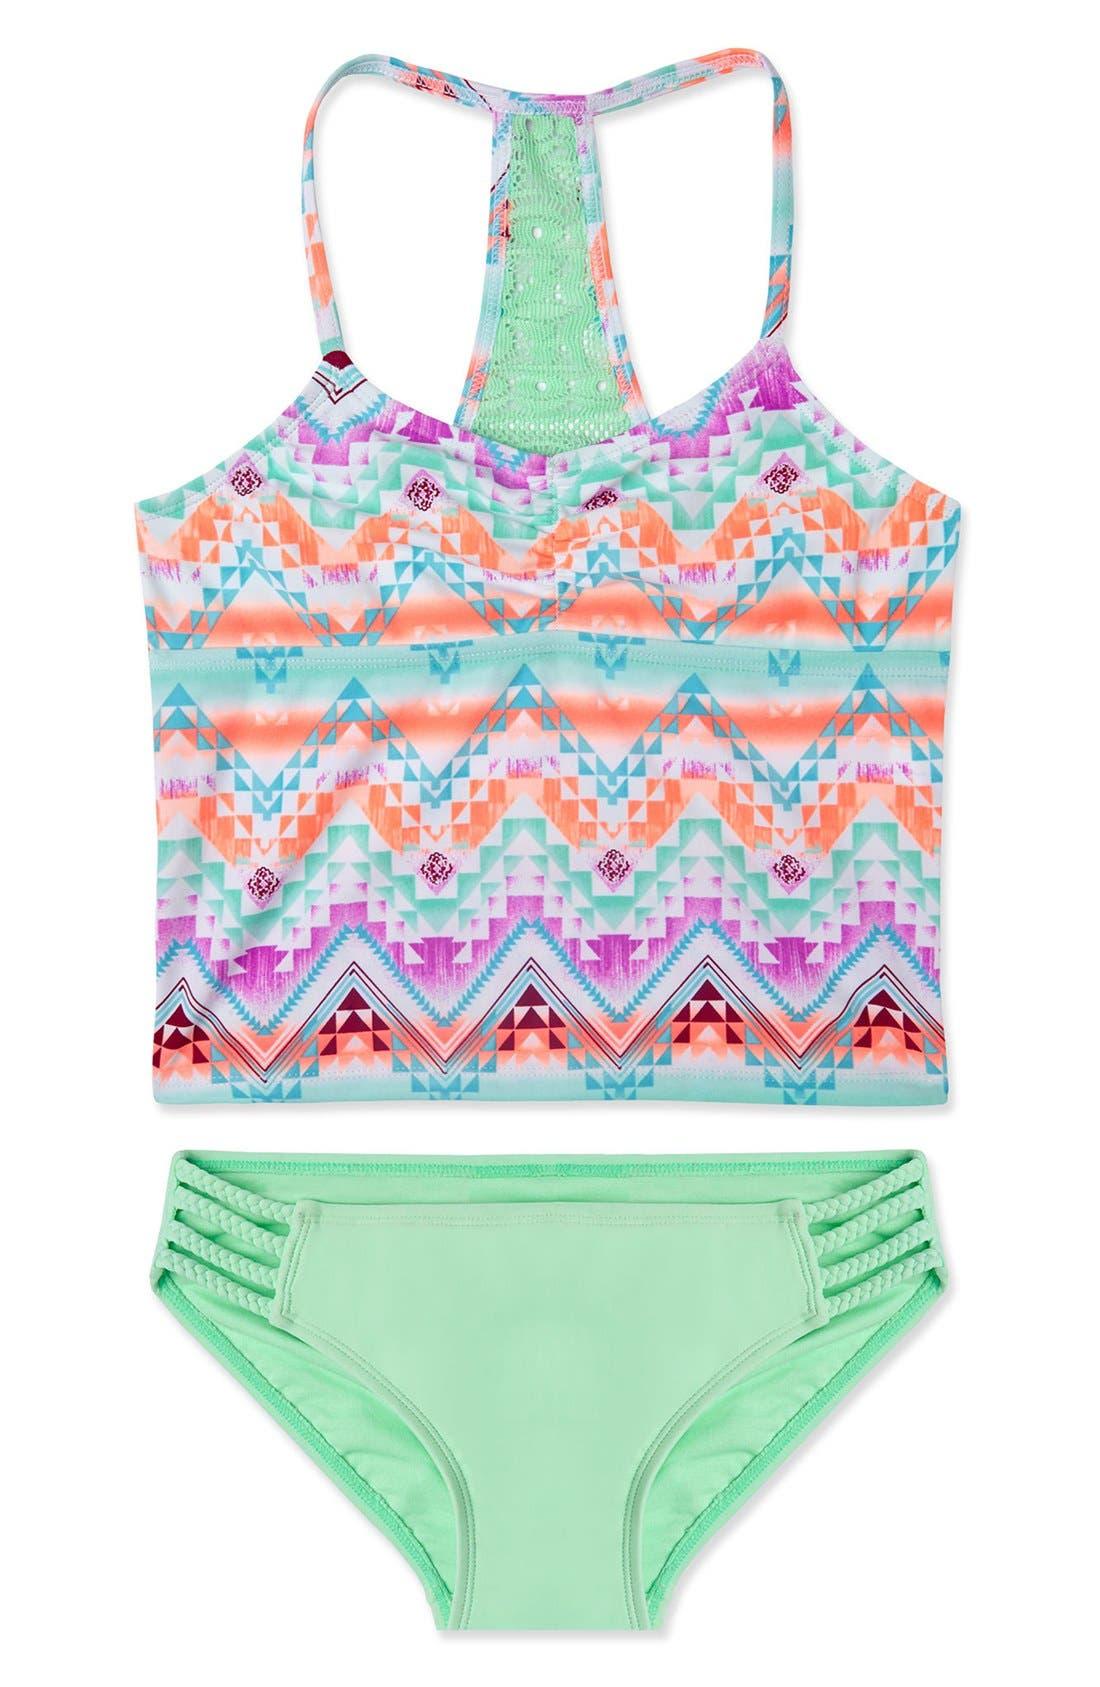 GOSSIP GIRL 'Desert Mirage' Two-Piece Swimsuit Set